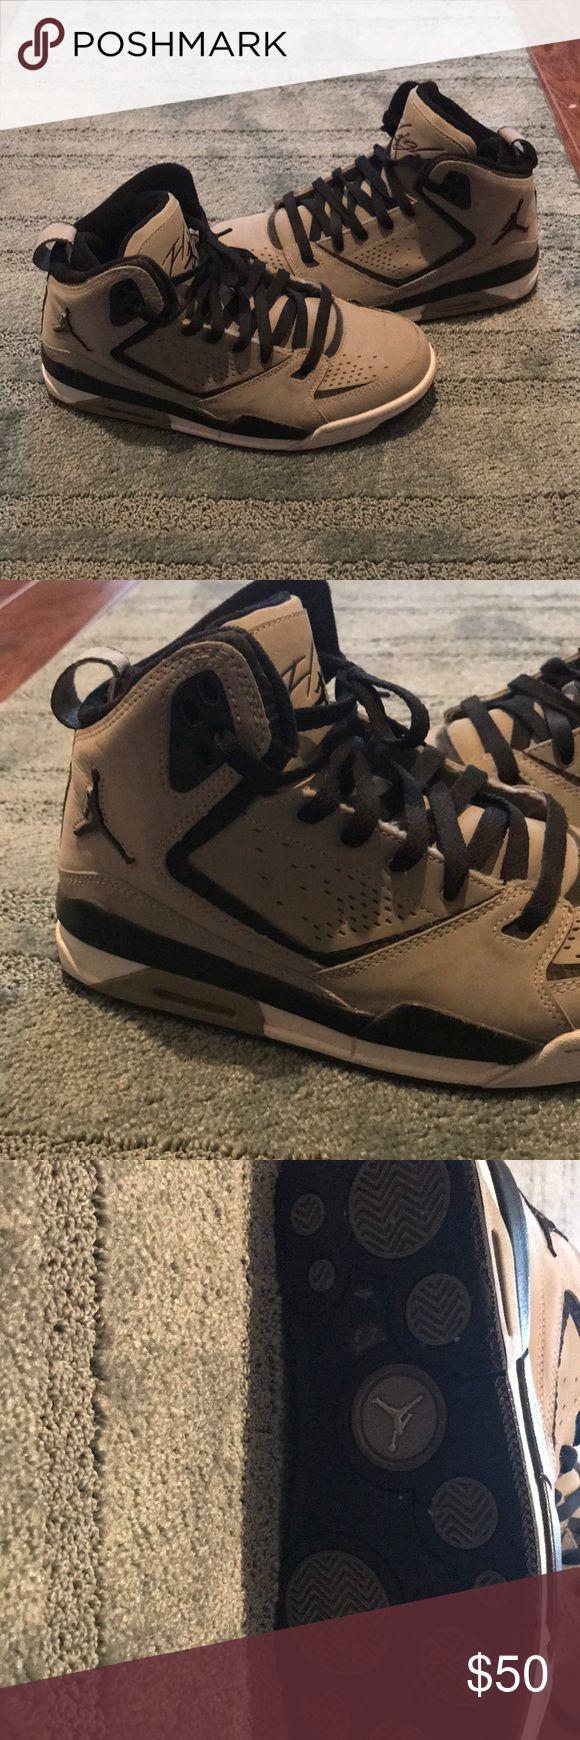 Flight Jordans Men's size 7.5 Jordan Shoes Sneakers